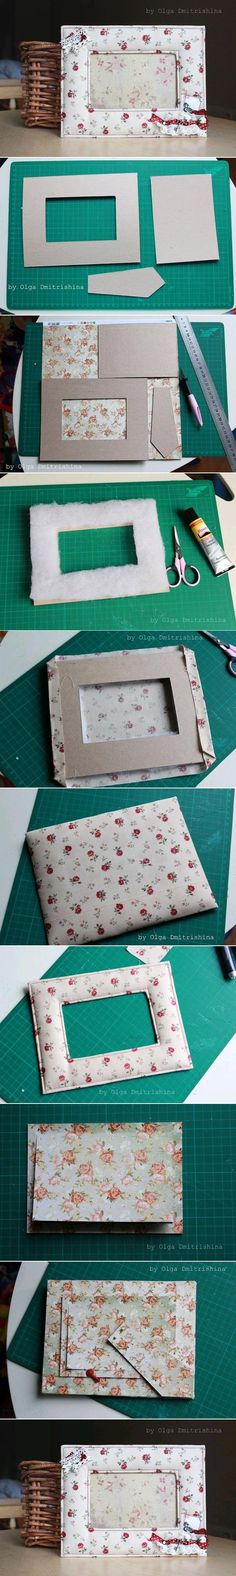 DIY Soft Picture Frame